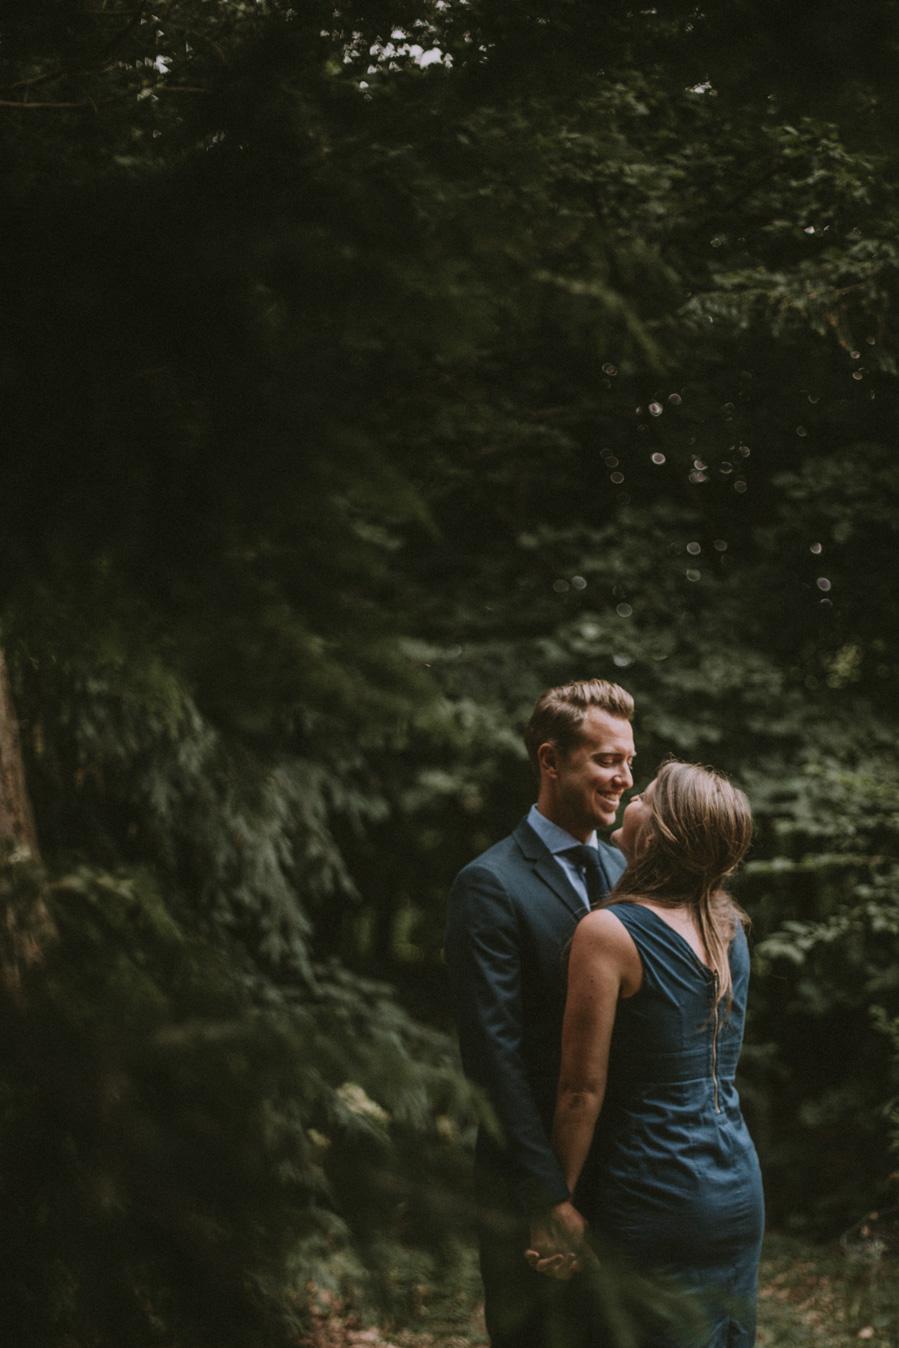 alnarp,fotografering,bröllopsfotograf,skåne,romantisk,par,fotografering